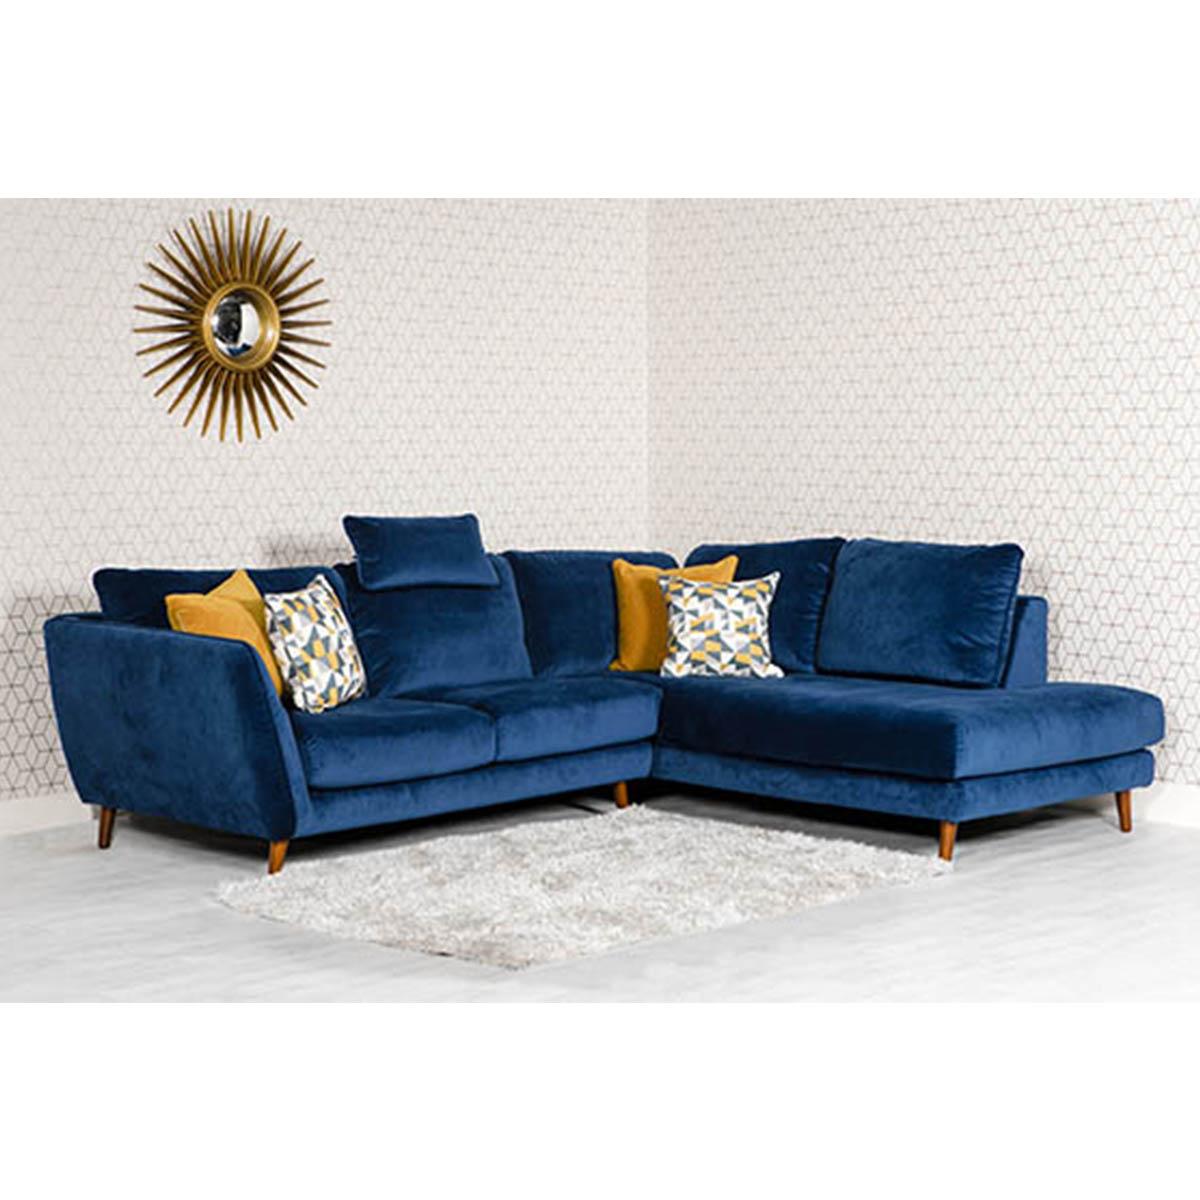 Blue Velvet Sofa With Dark Wooden Legs ⋆ AM Interiors